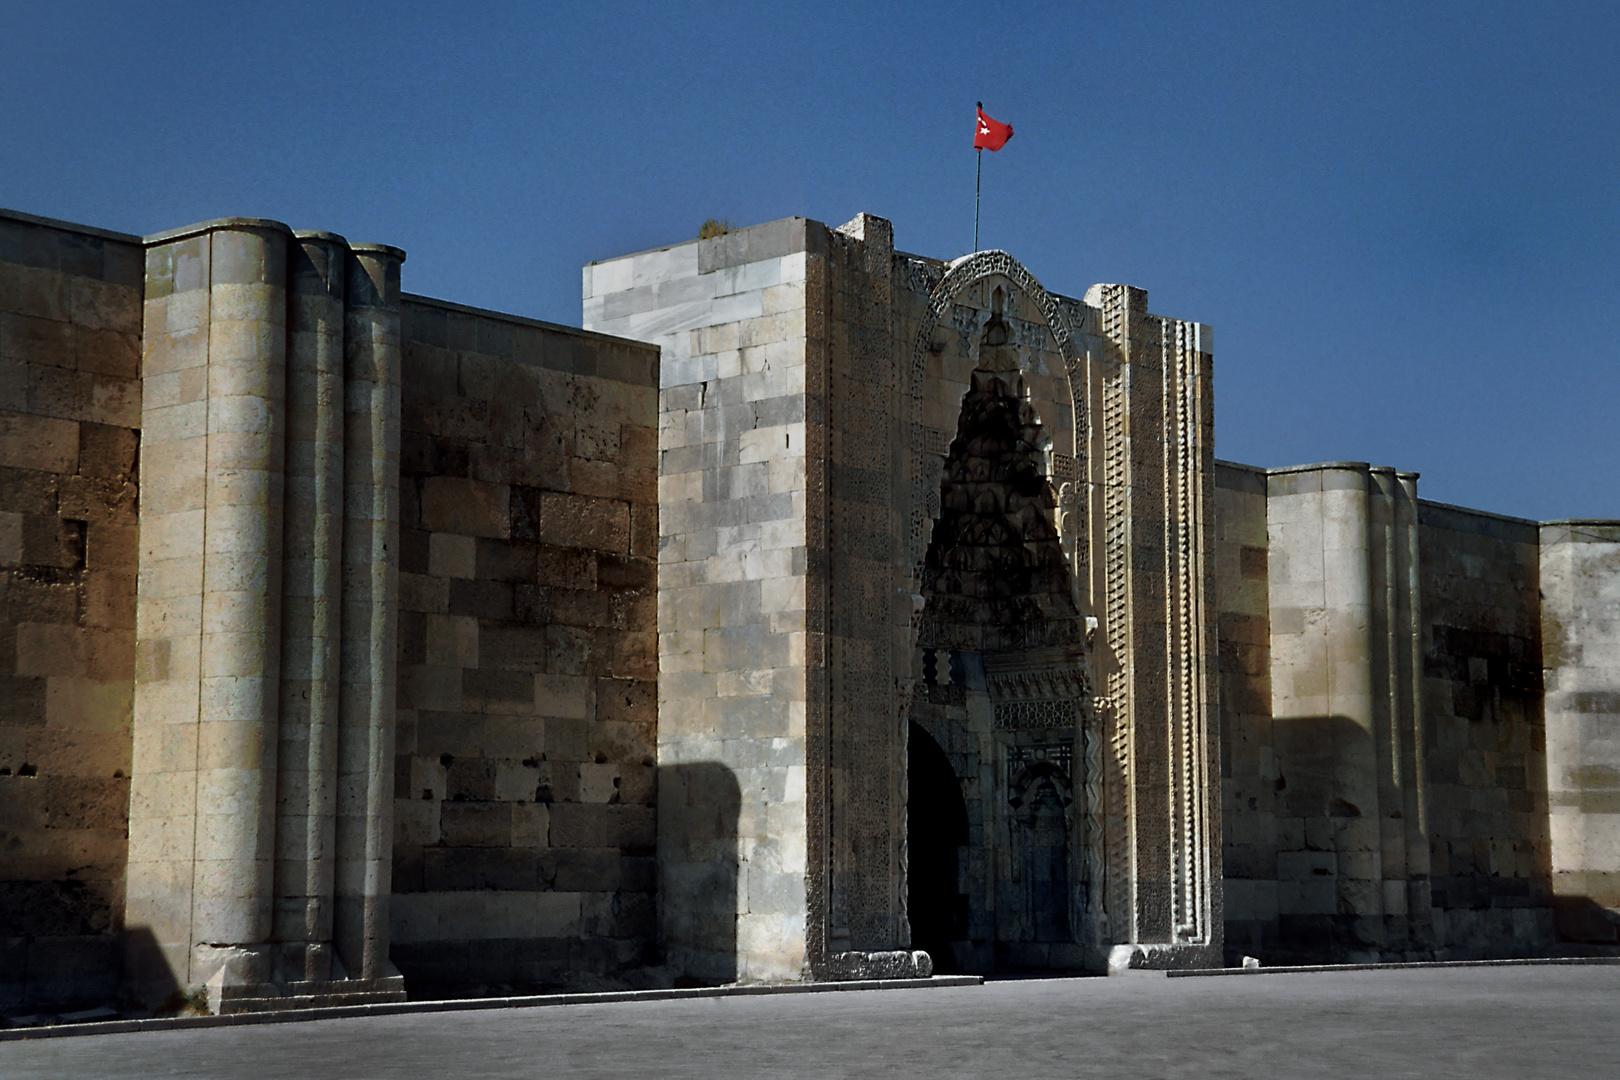 Die Karawanserei Sultan Han bei Aksaray